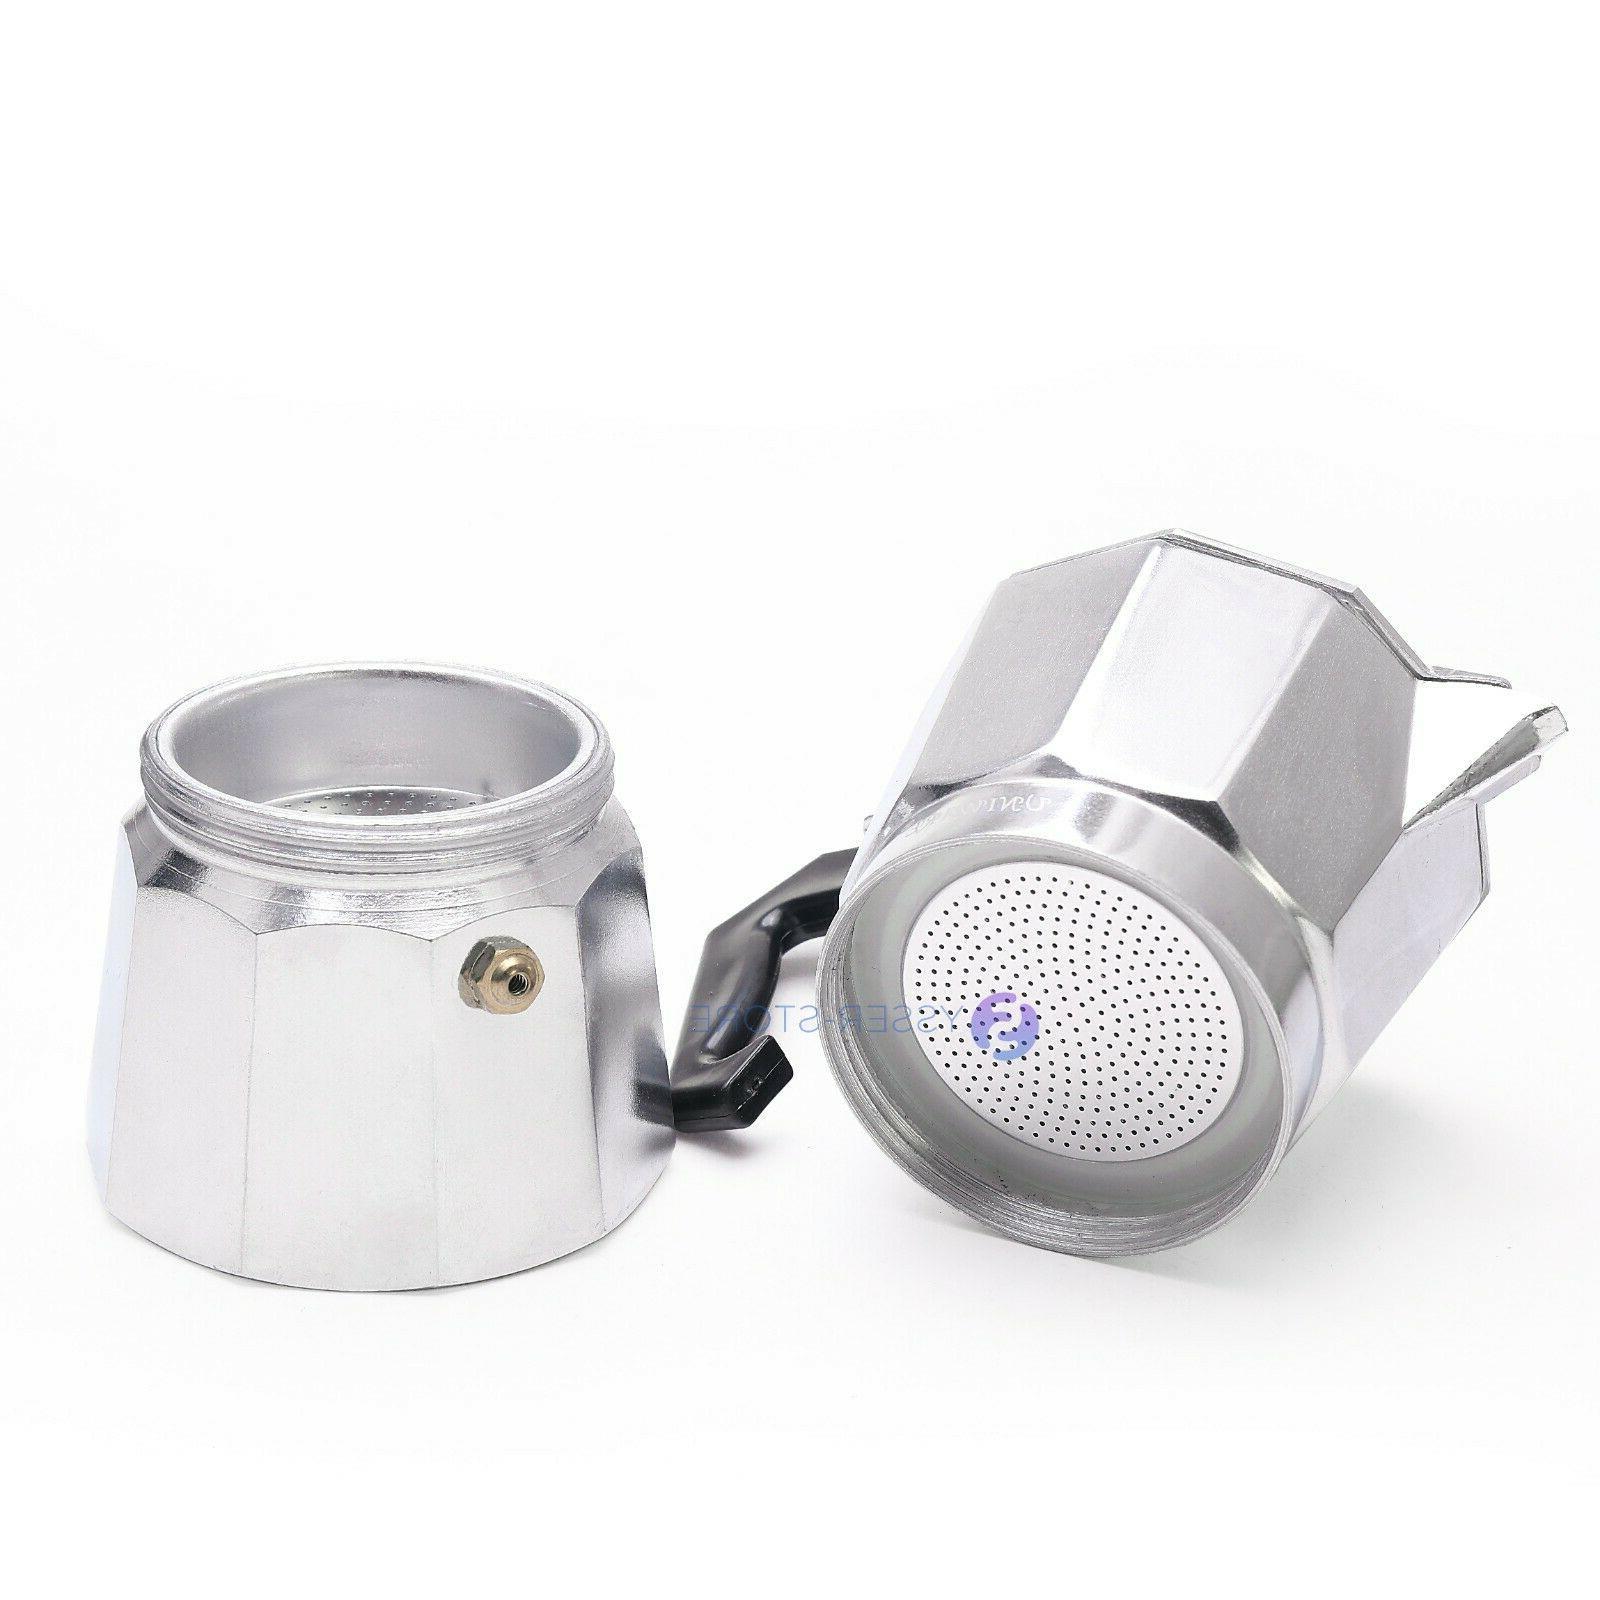 Aluminium Stove-Top Manually Moka 6, 9 Cafetera